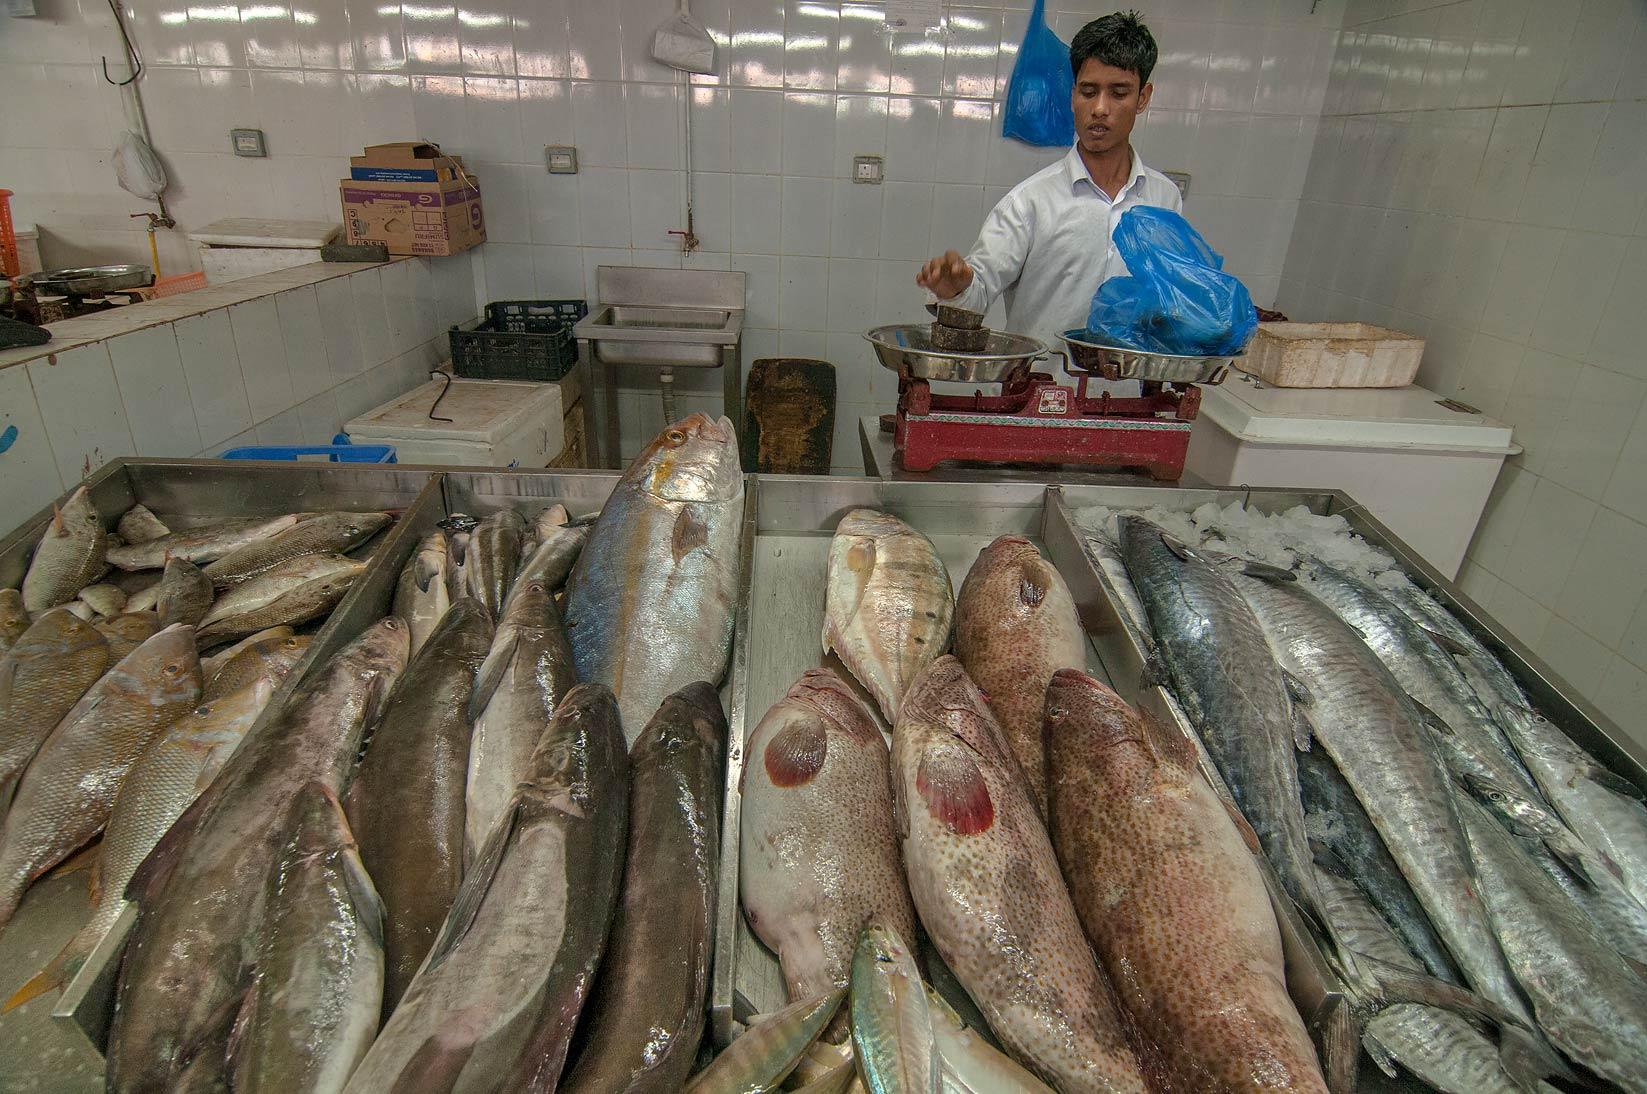 Photo 1166 26 weighting fish in wholesale fish market for Wholesale fish market